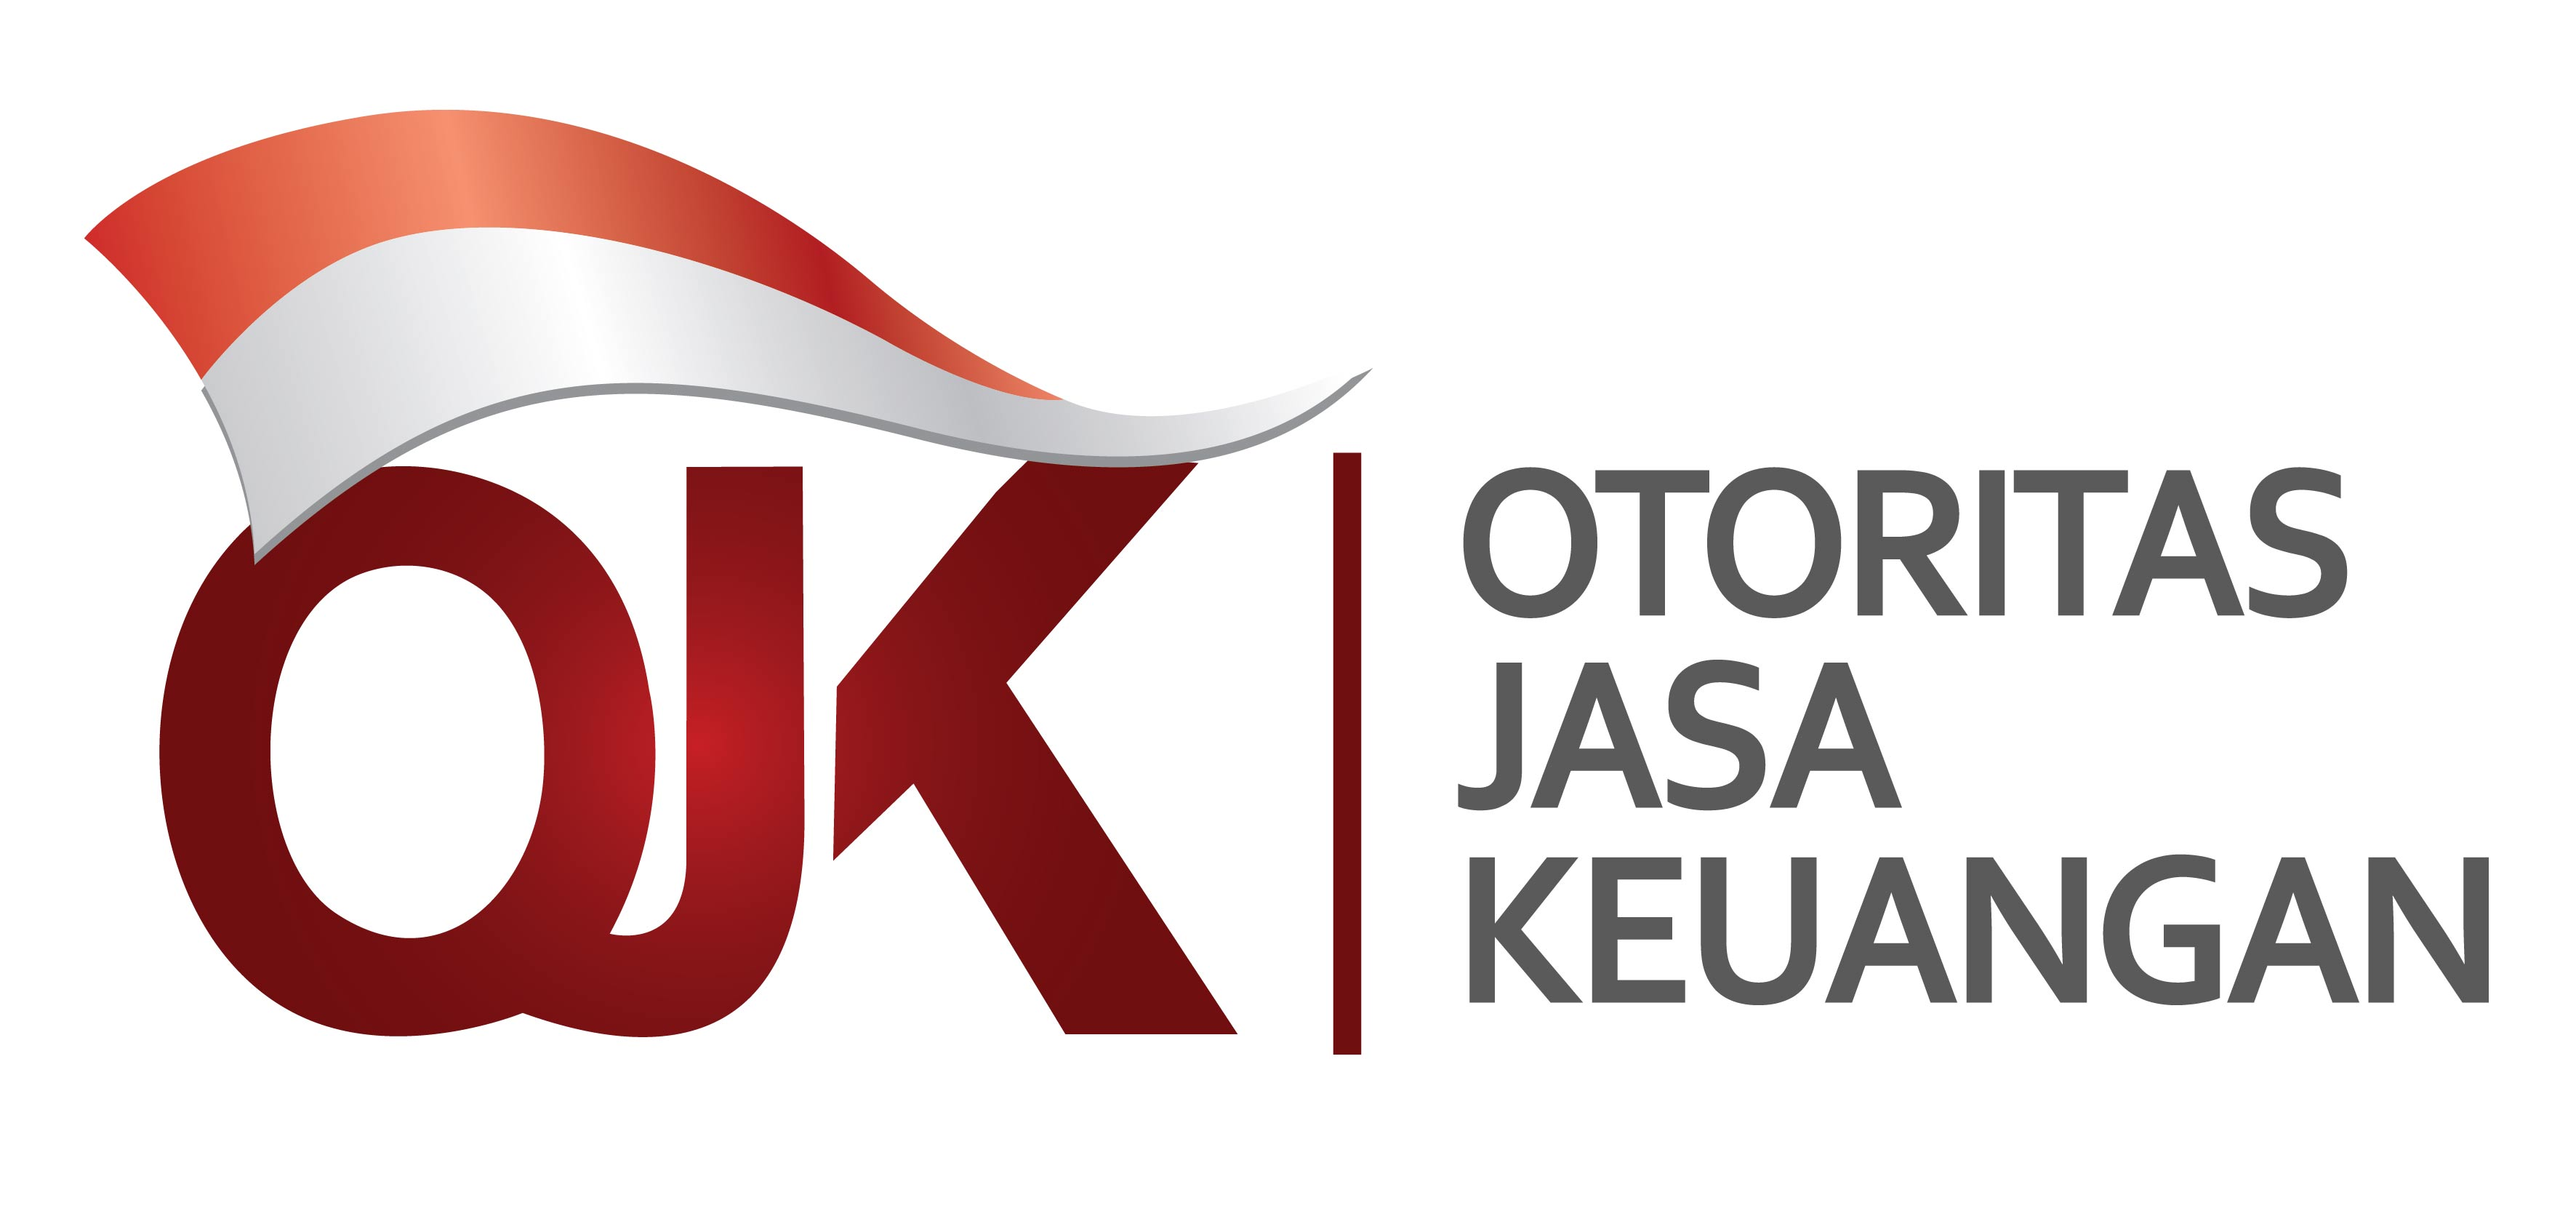 ojk indonesia